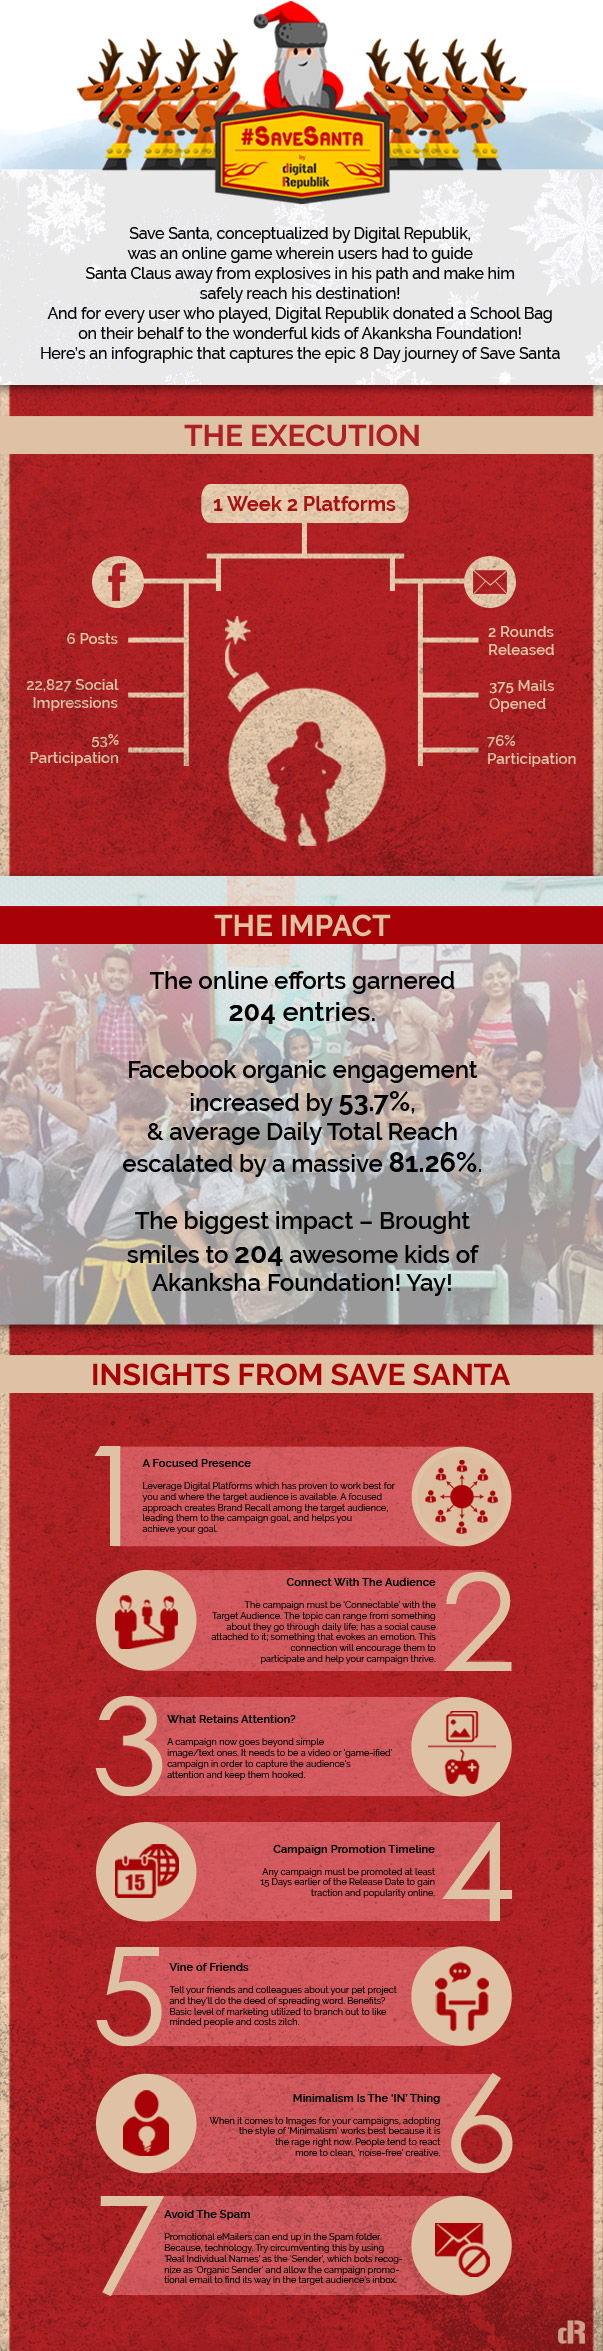 Save Santa by Digital Republik